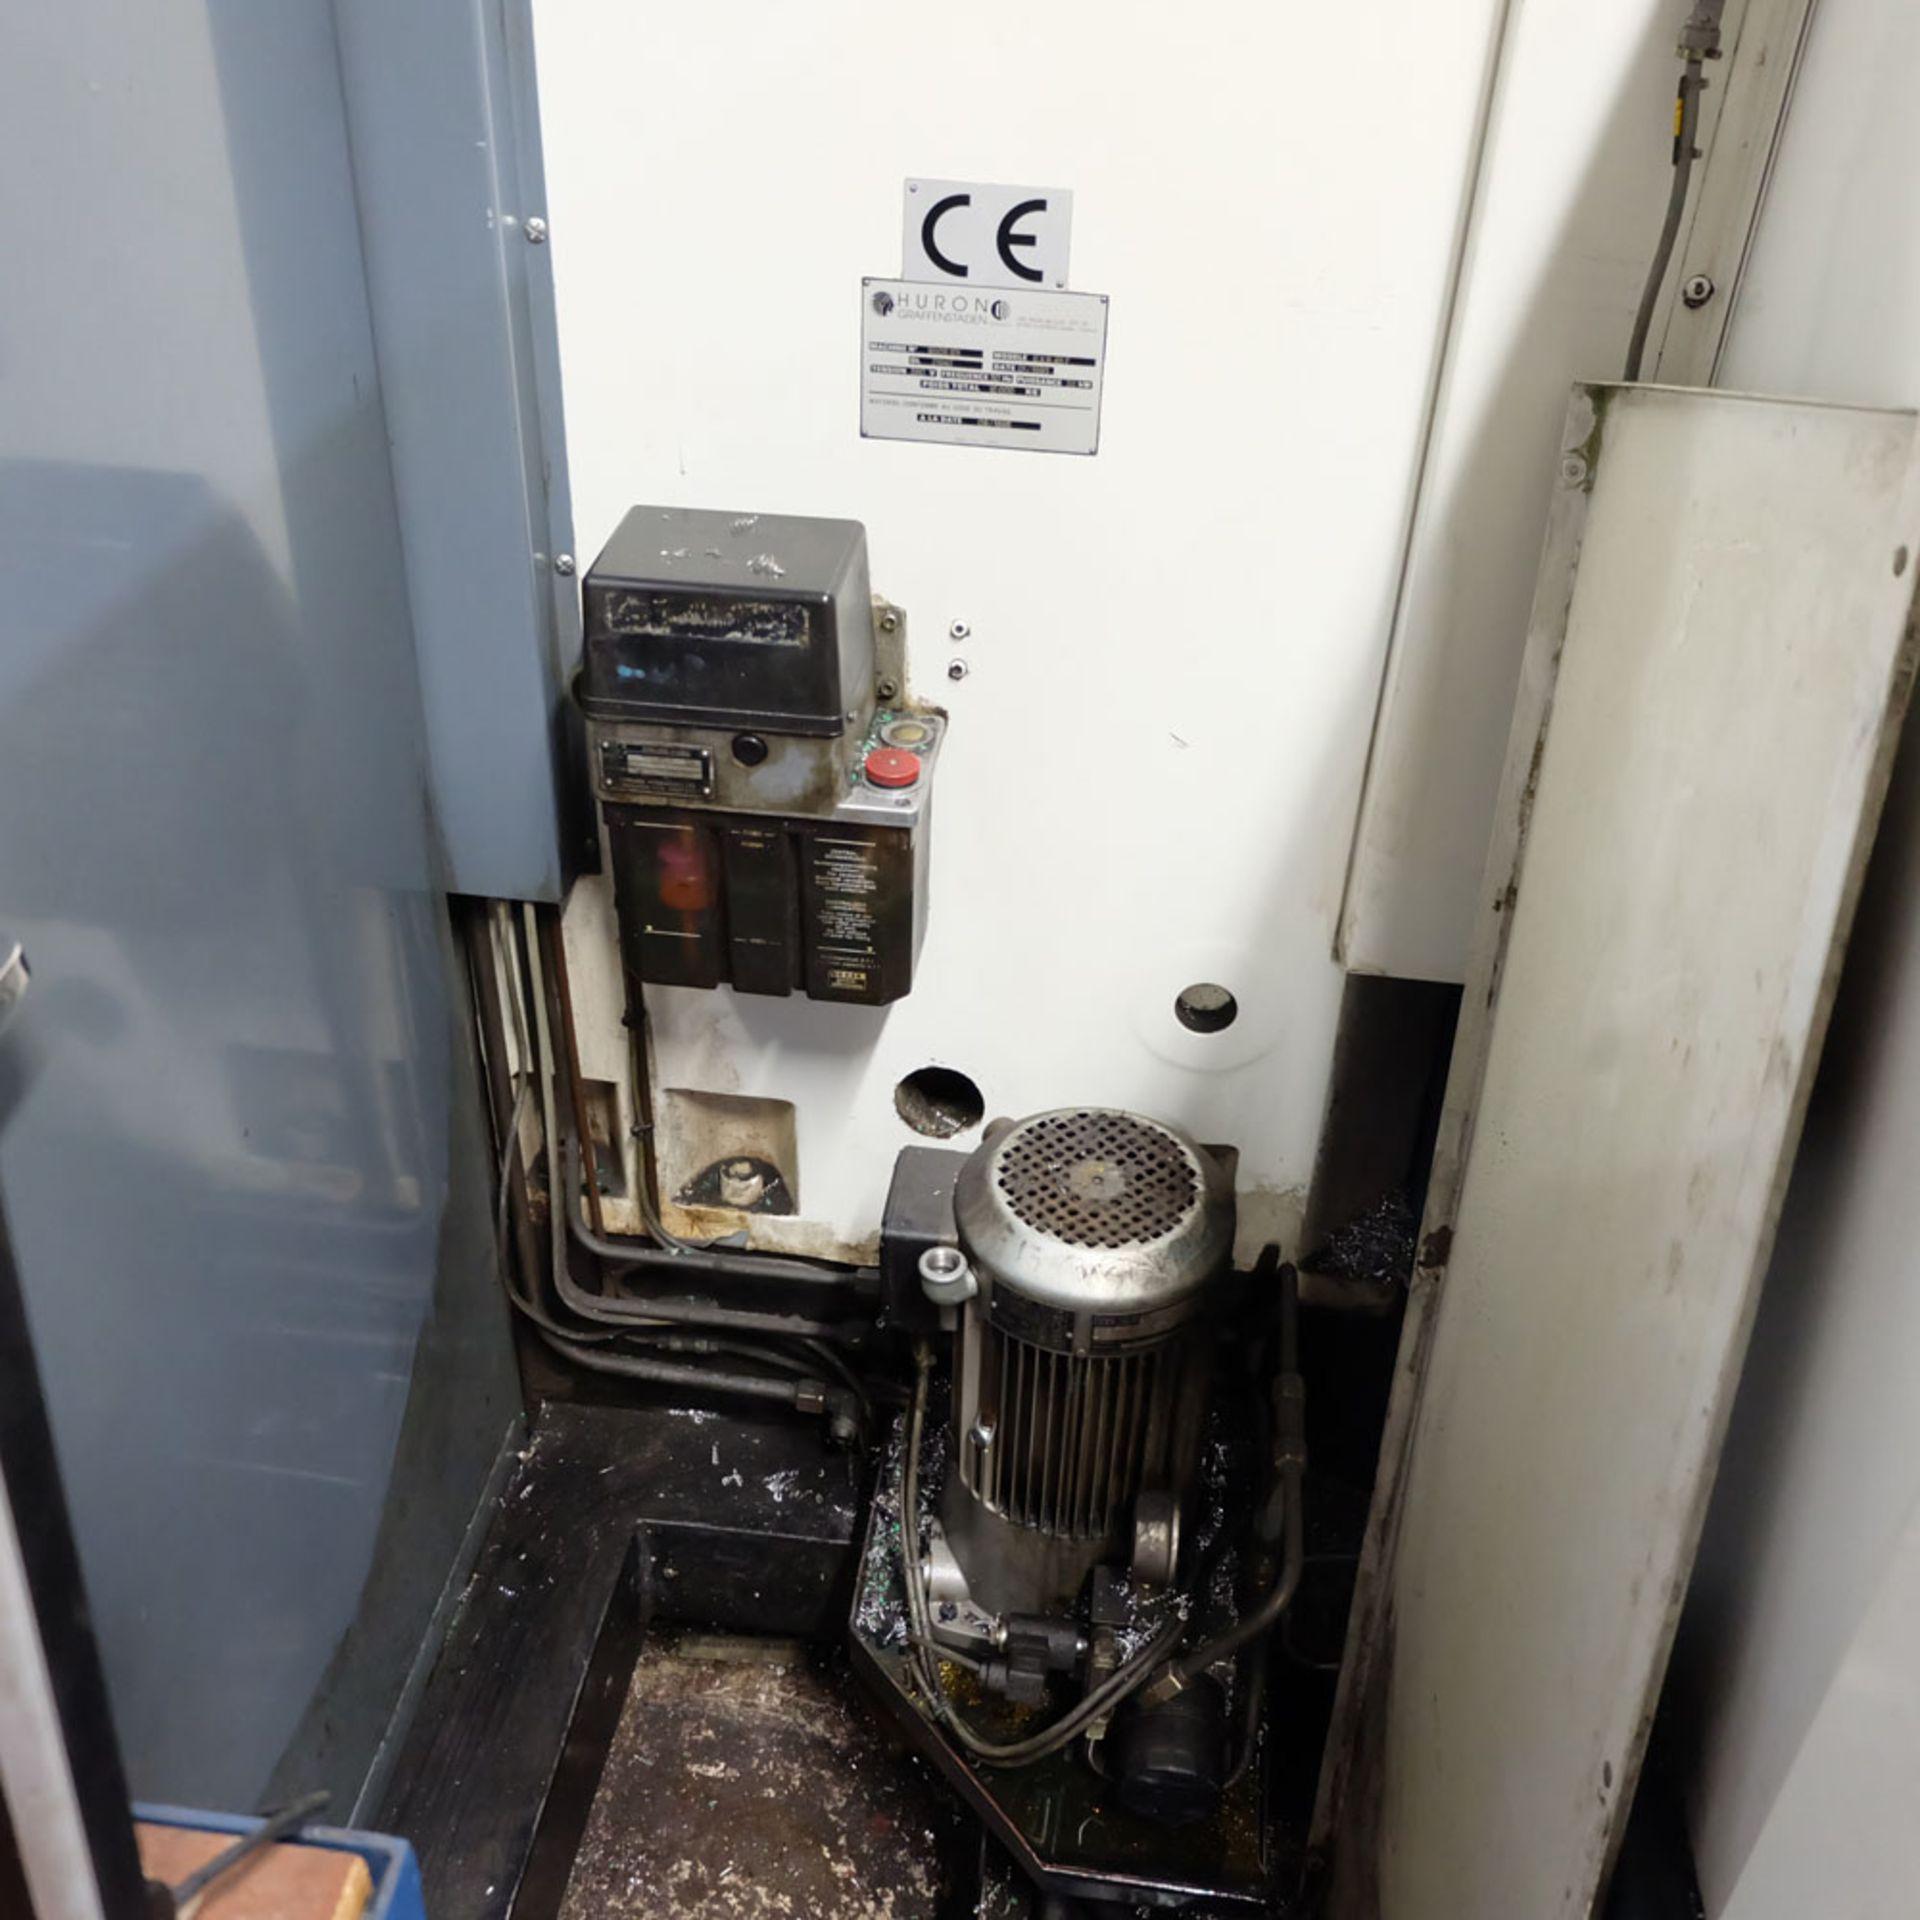 Huron GX 411 F Bed Type Milling Machine. Control Unit: CNC (HEIDENHAIN TNC 415B) - Image 9 of 12